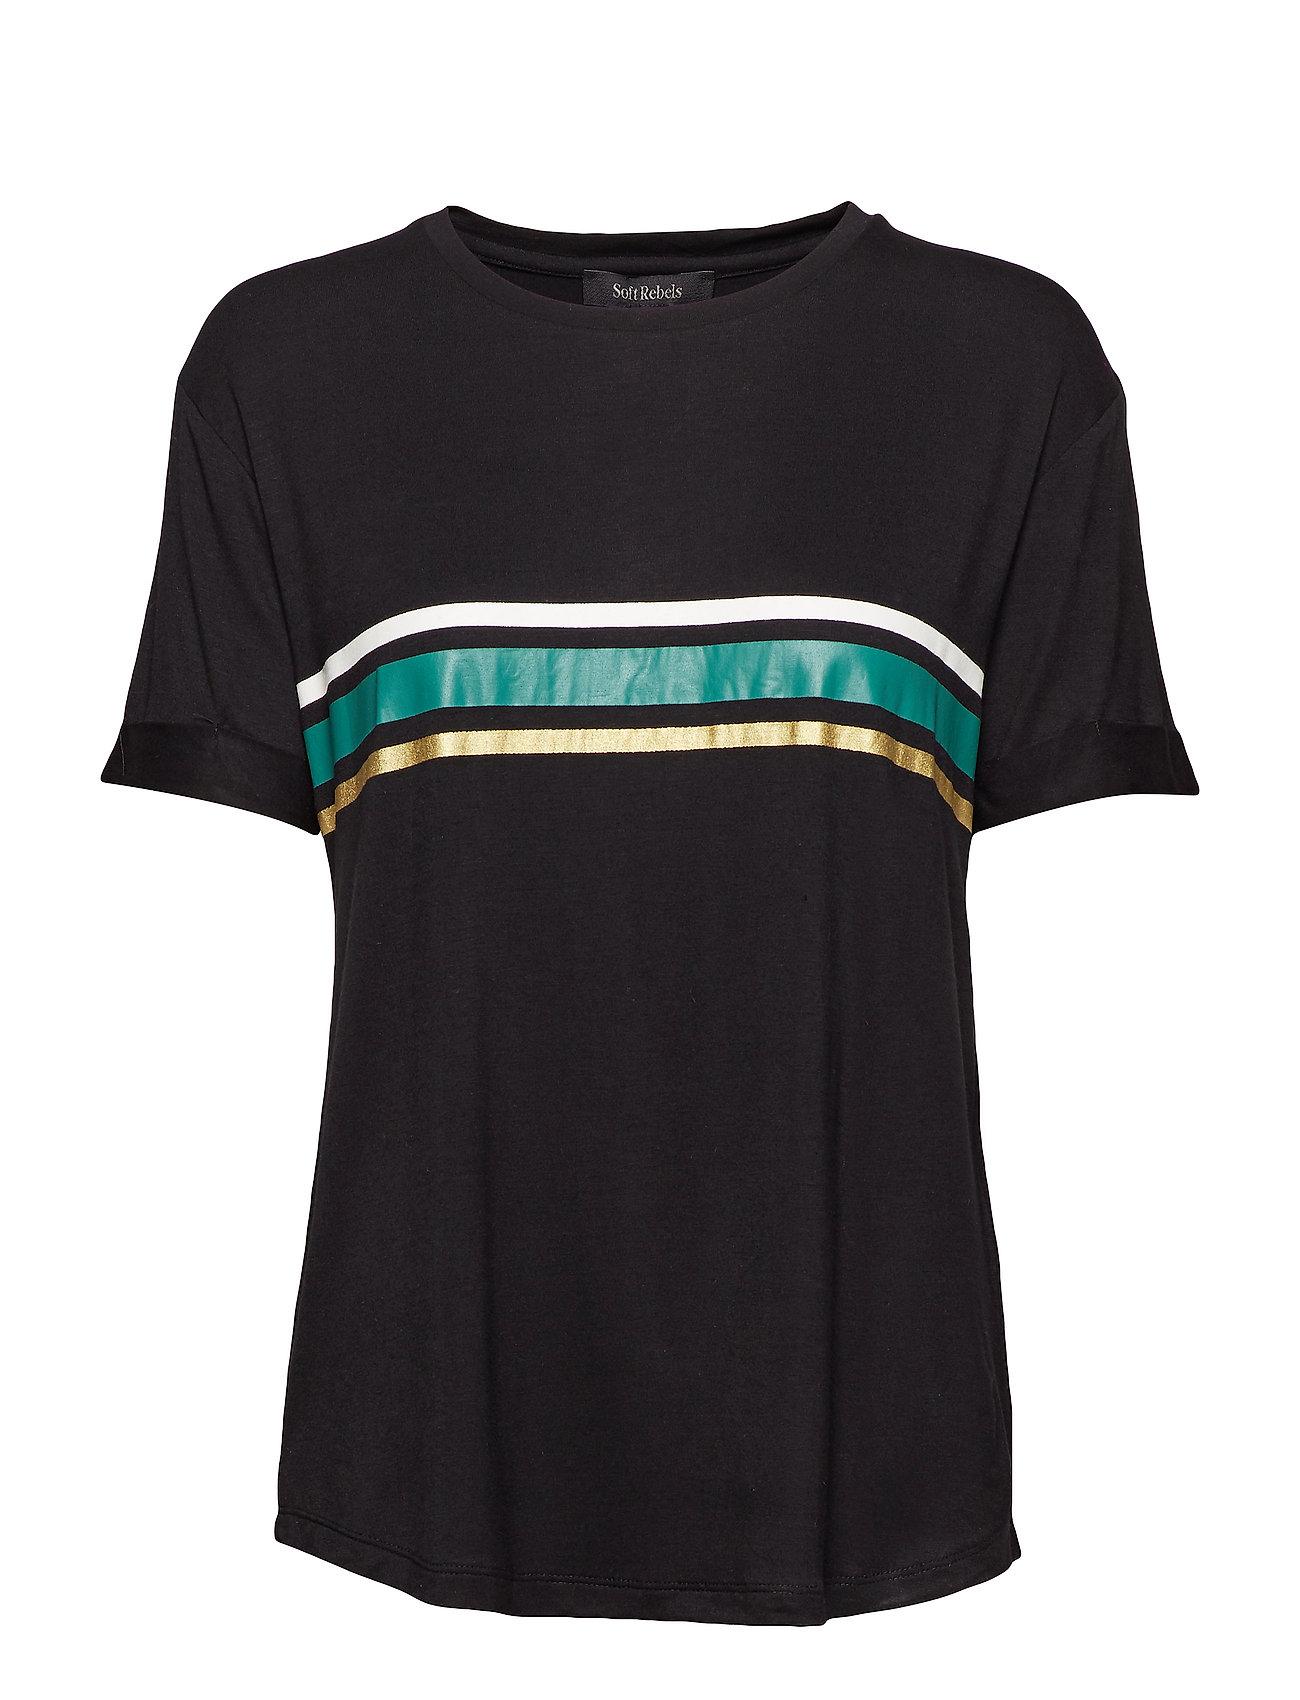 Soft Rebels Elvaline T shirt Ögrönlar